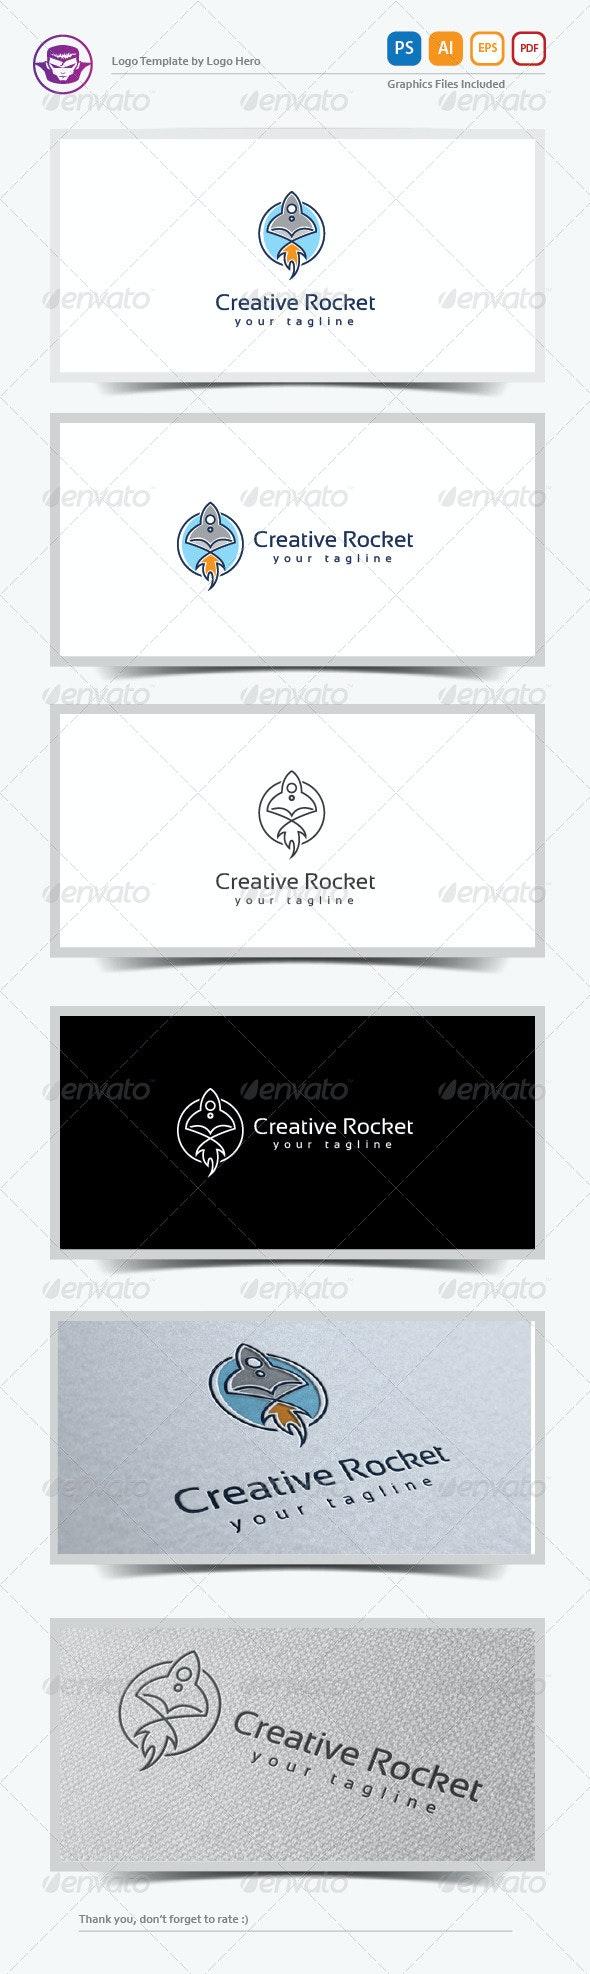 Creative Rocket Logo Template - Objects Logo Templates